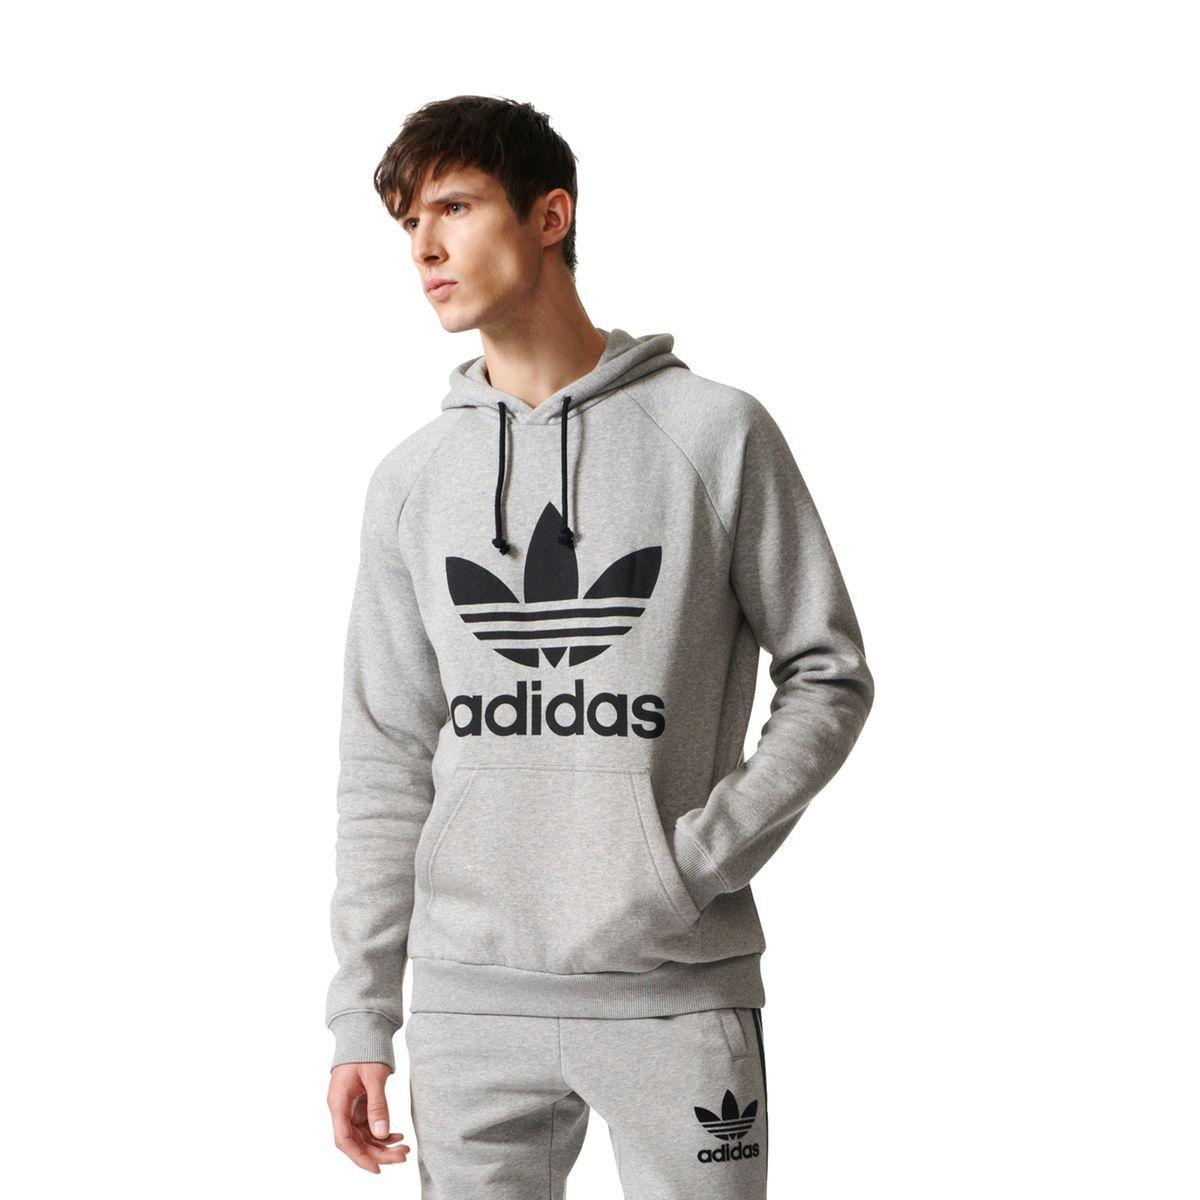 Predownload: Sweat Ferme A Capuche Taille L Xl M Mens Sweatshirts Hoodie Adidas Originals Mens Sweatshirts [ 1200 x 1200 Pixel ]